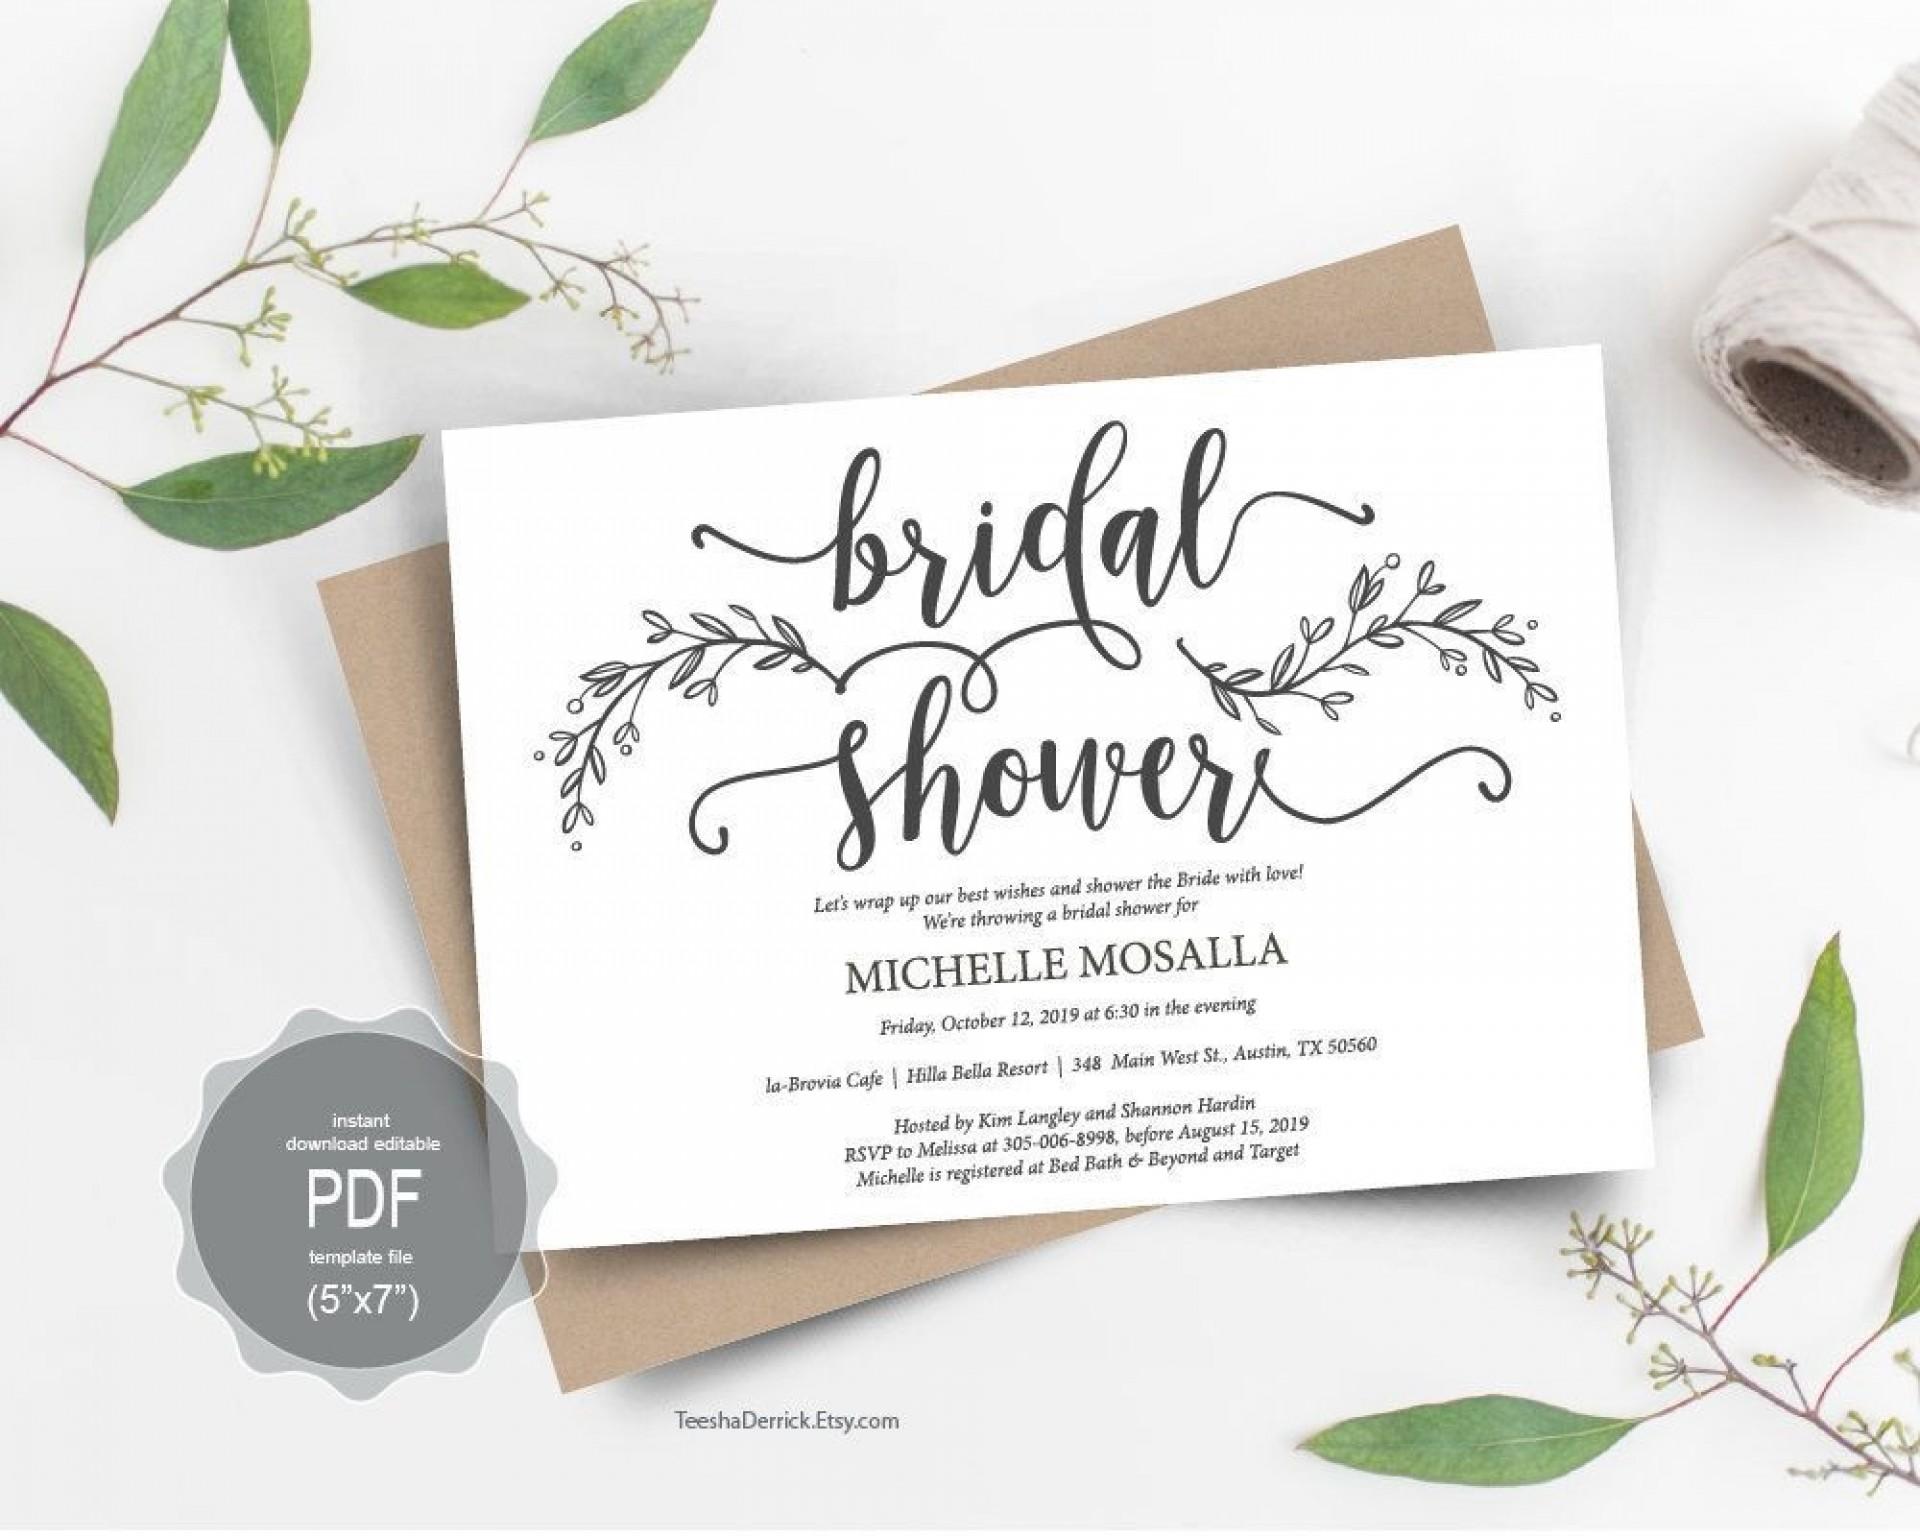 000 Imposing Bridal Shower Card Template Sample  Invitation Free Download Bingo1920